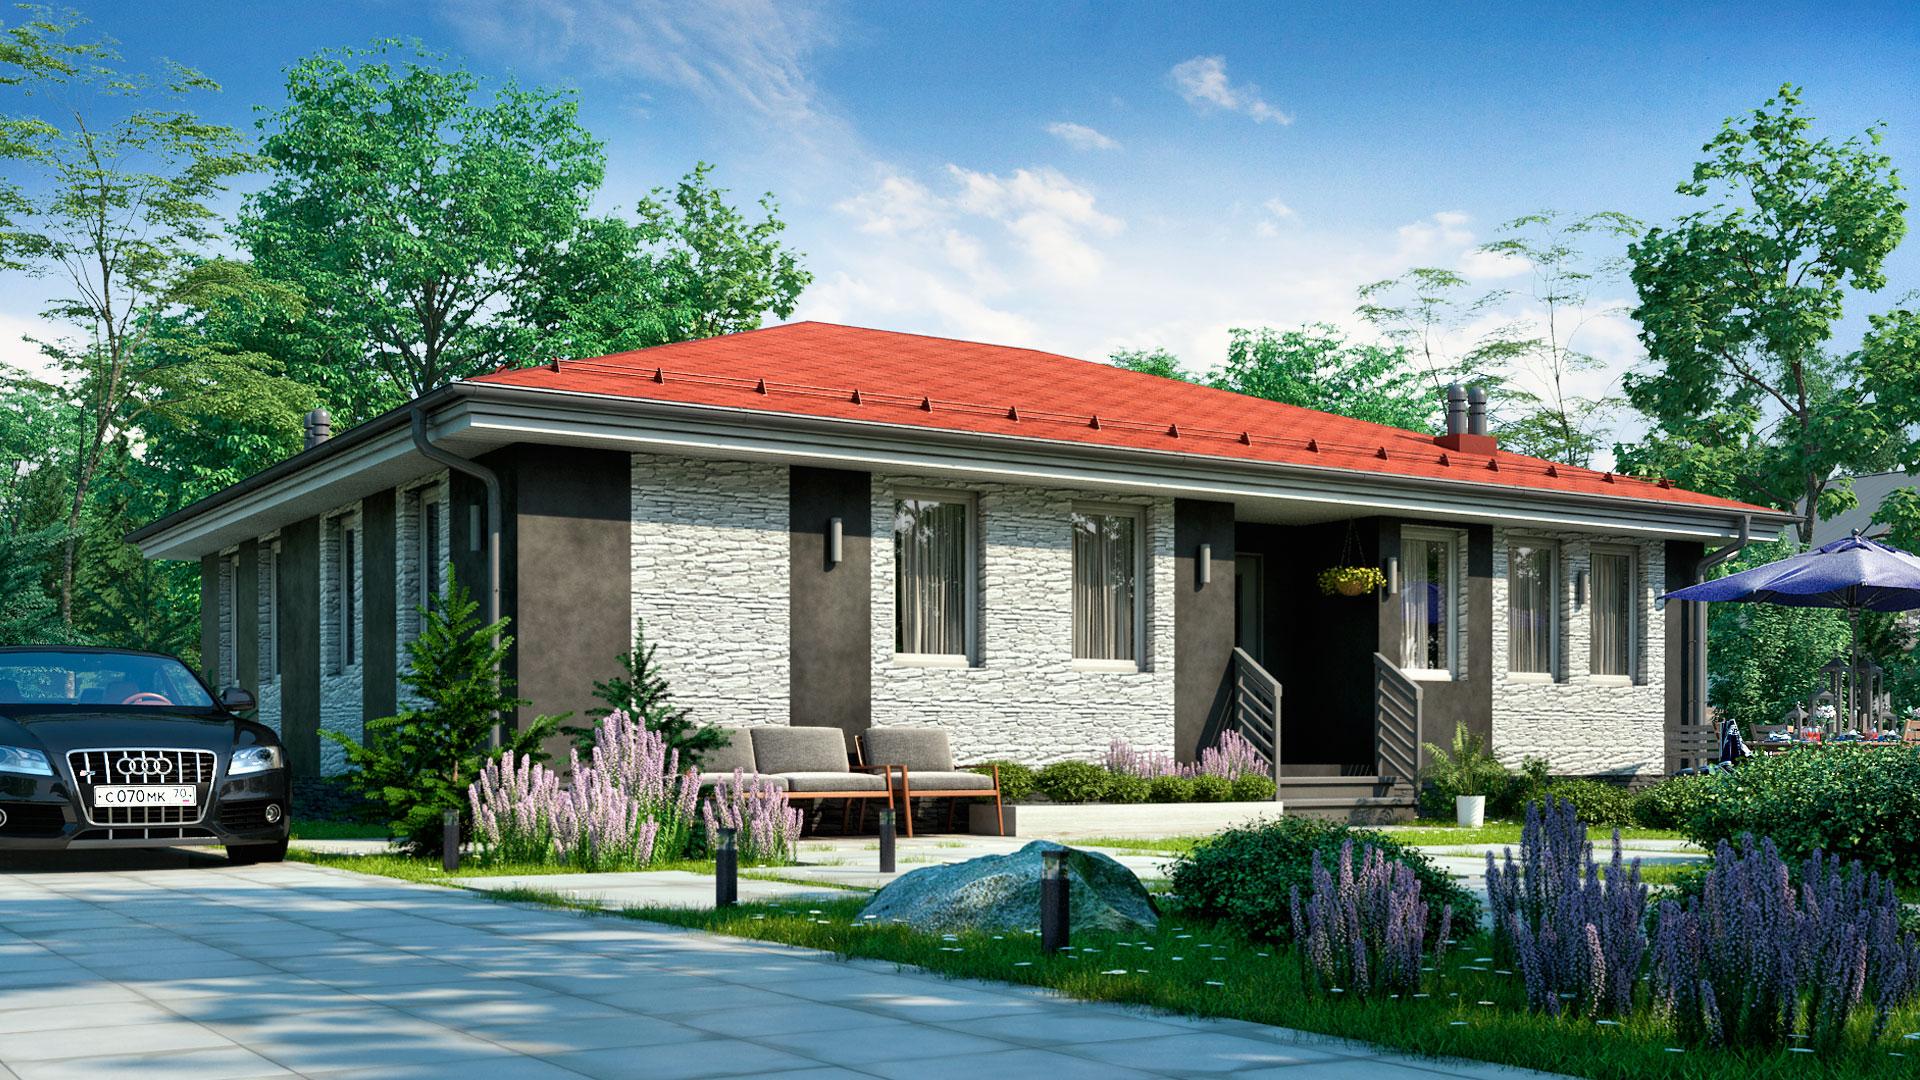 Передний фасад дома из железобетонных панелей. Проект БП-127.